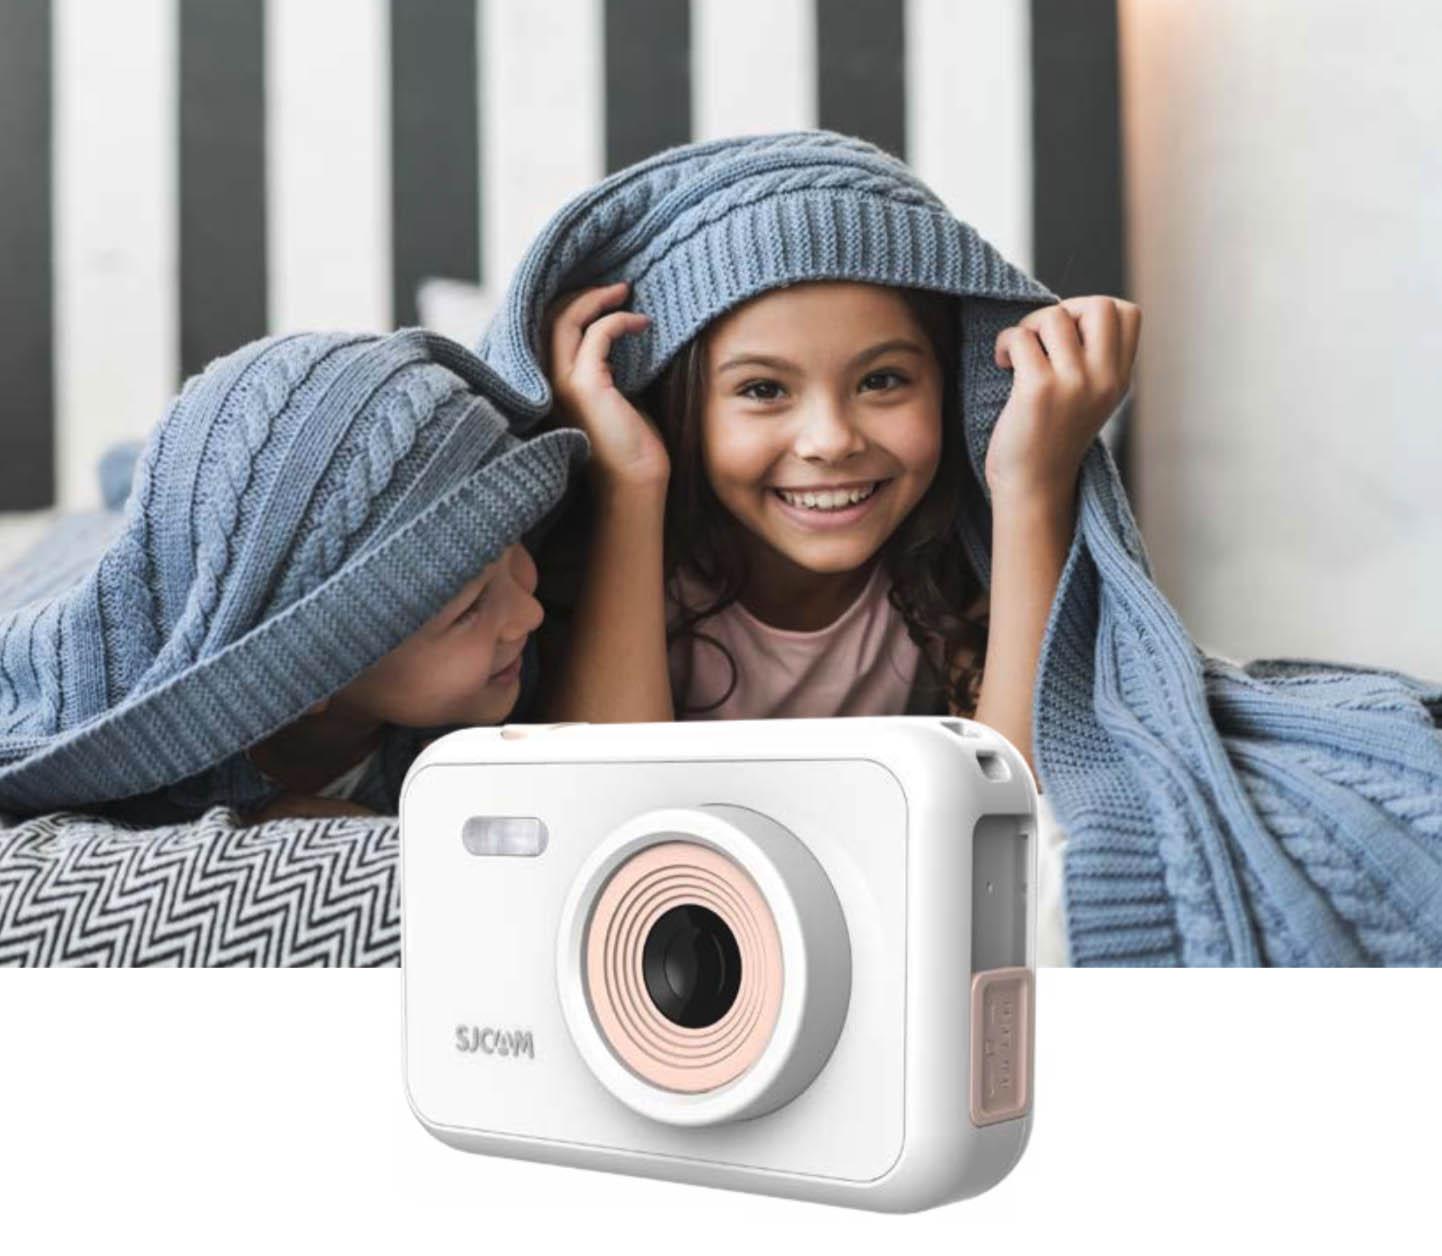 funcam-kids-hd-camera-features-2